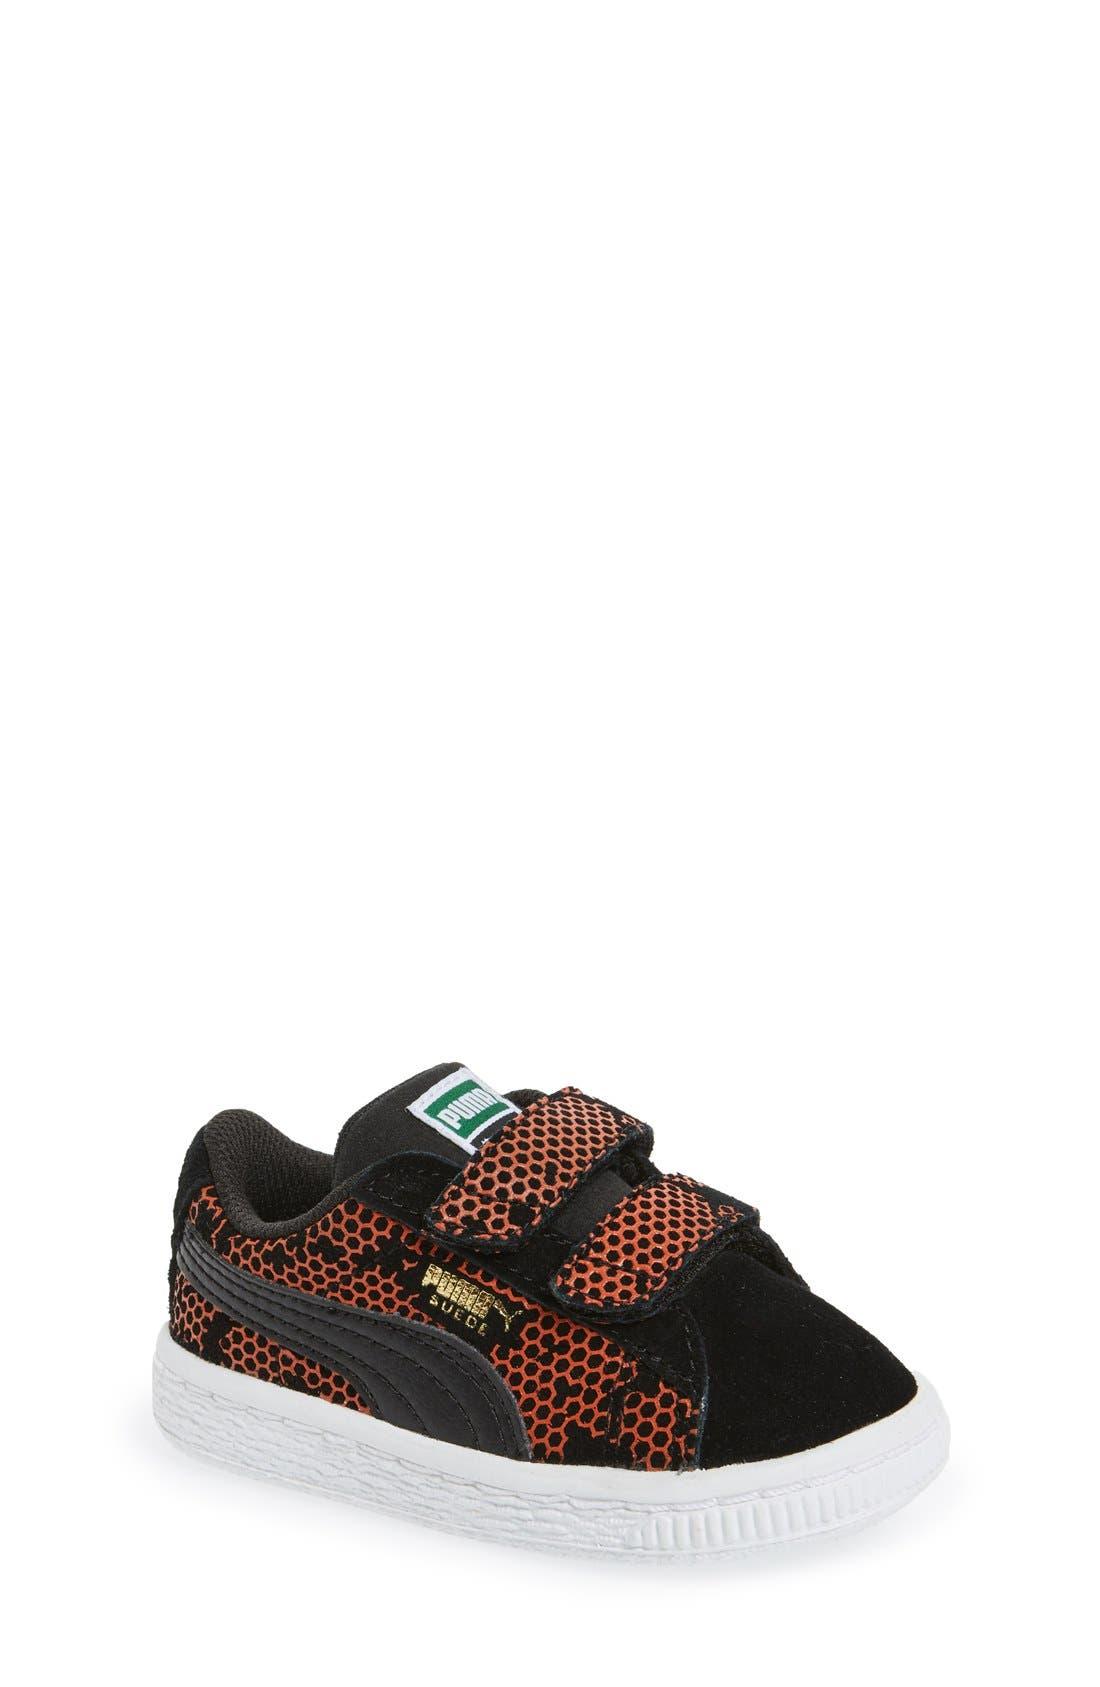 'Night Camo' Sneaker,                             Main thumbnail 1, color,                             Puma Black/ Mandarine Red